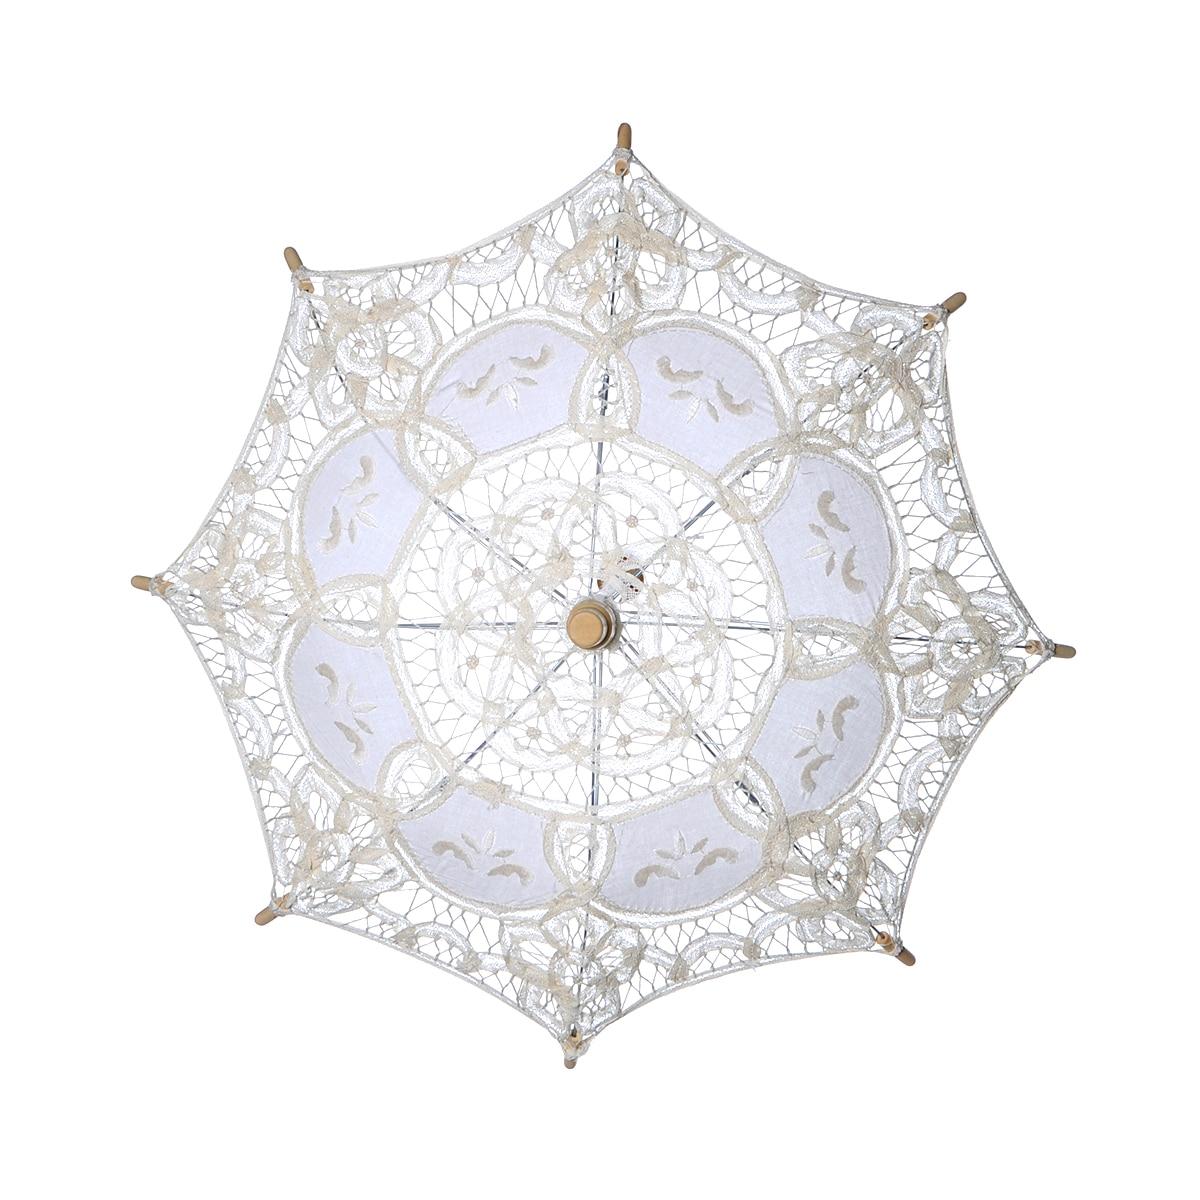 Image 3 - Bridal Wedding Umbrella Lace Cotton Embroidery Handmade Parasol Umbrella For Wedding Romantic Photo Props L Size 60cmBridal Umbrellas   -